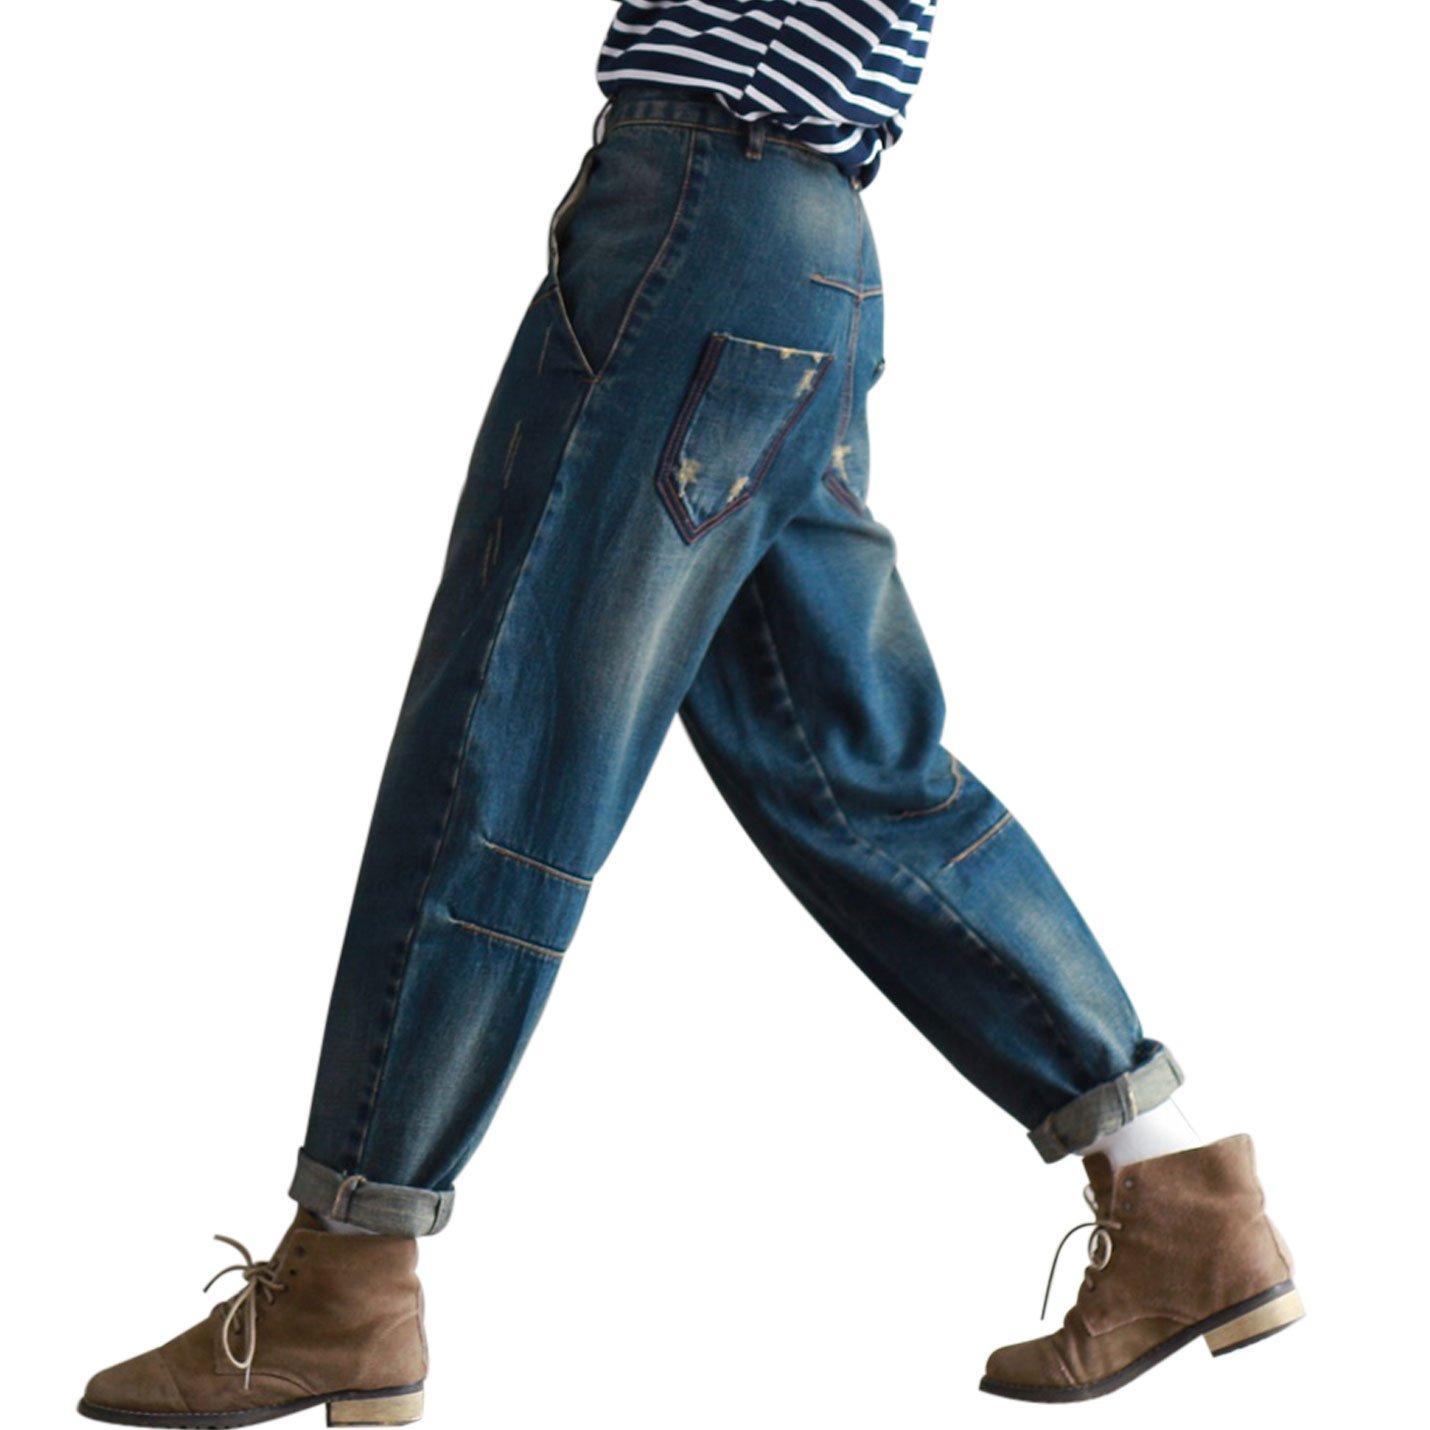 Yeokou Women's Casual Loose Distressed Baggy Harem Denim Jeans Cropped Pants (Large, Dark Blue) by Yeokou (Image #1)